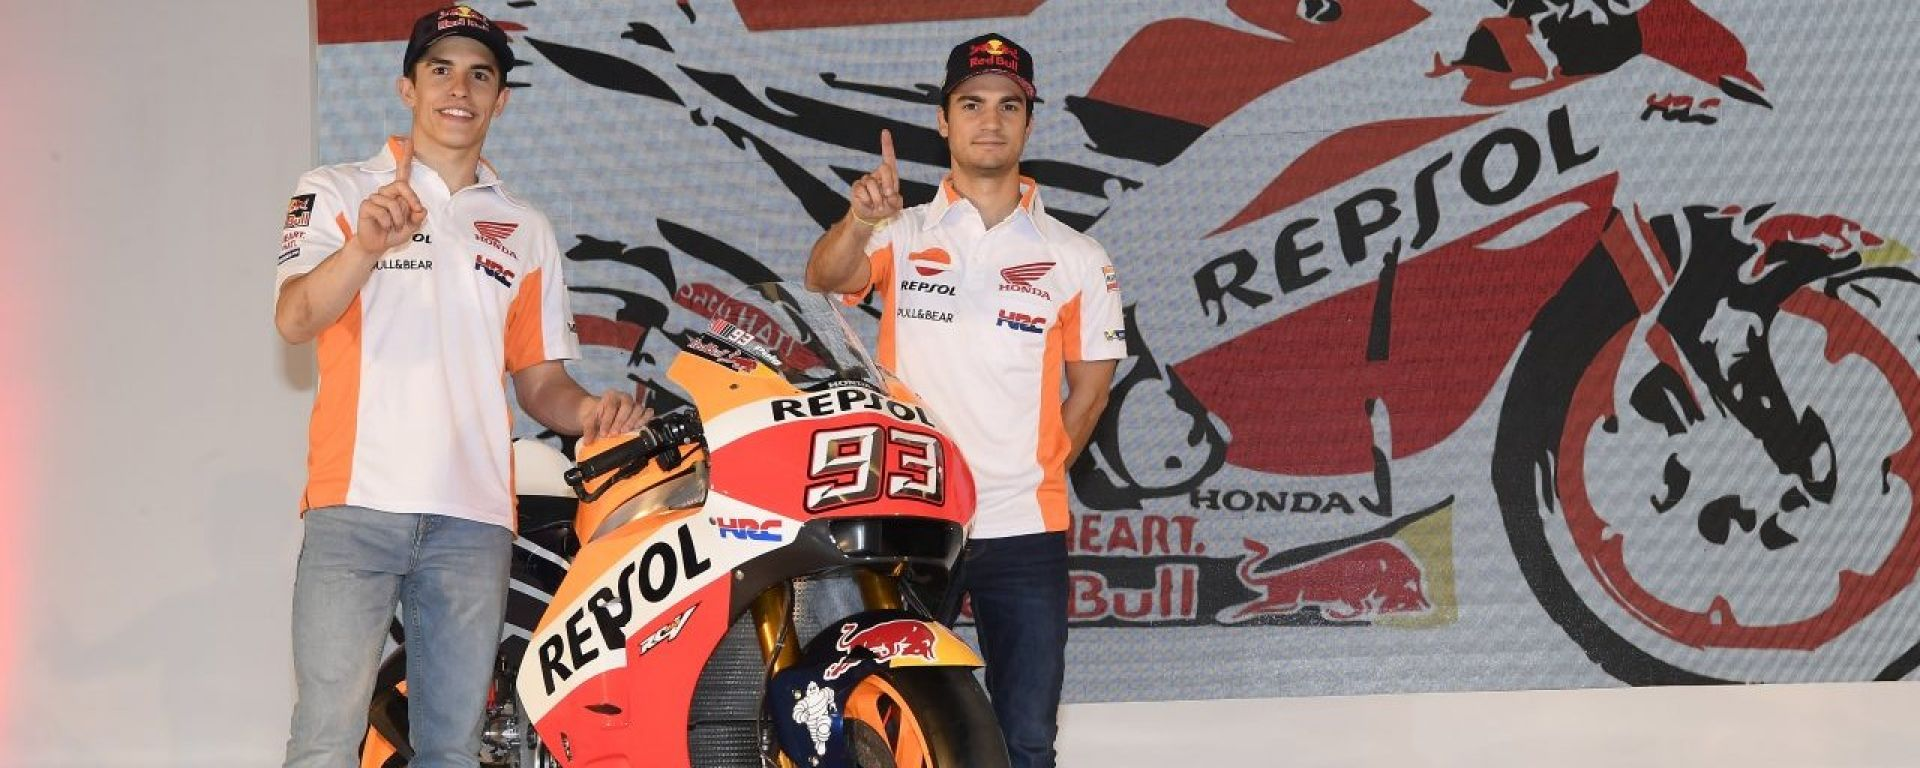 MotoGP 2017: Marc Marquez e Dani Pedrosa svelano la nuova Honda RC213V 2017